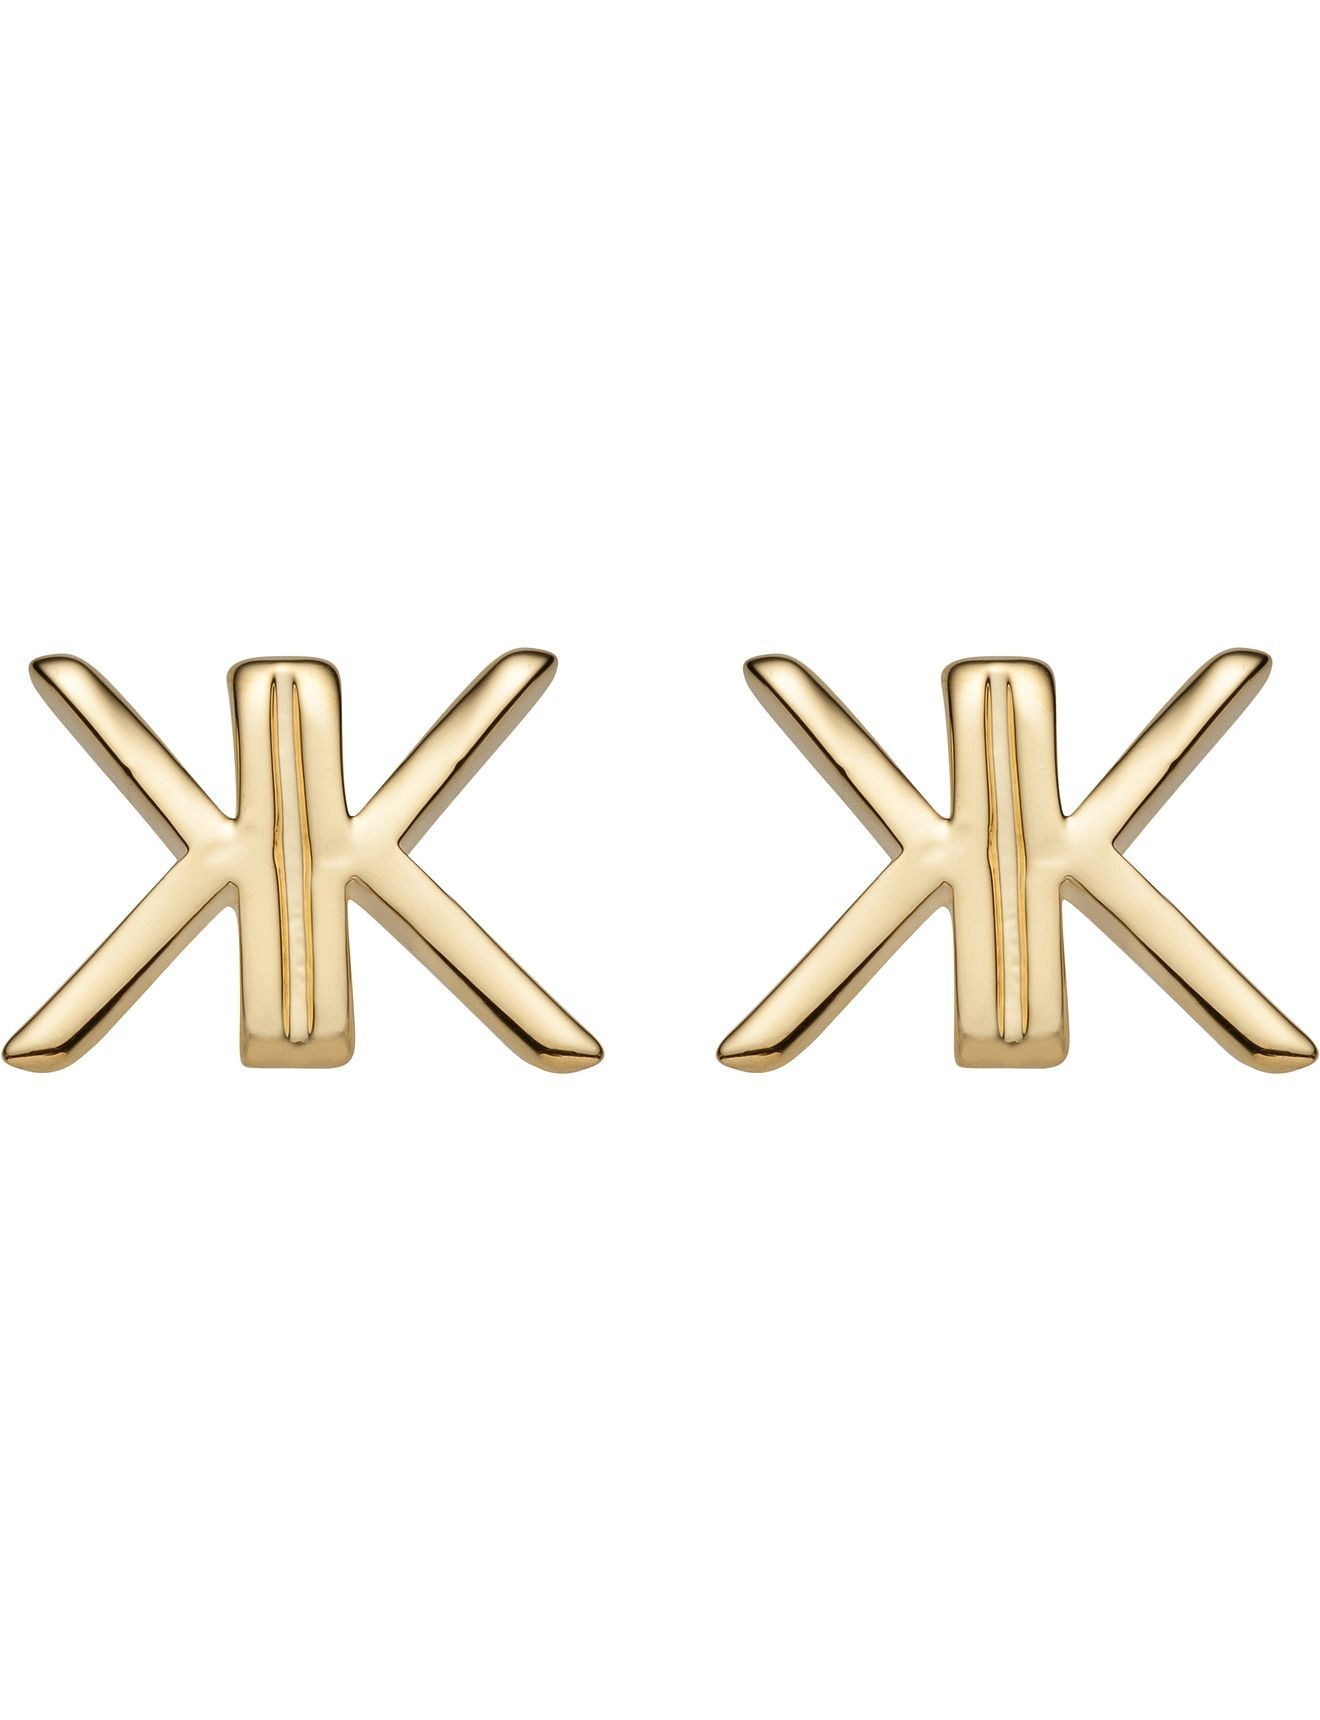 Kk logo studs david jones design pinterest david jones and kk logo studs david jones buycottarizona Image collections